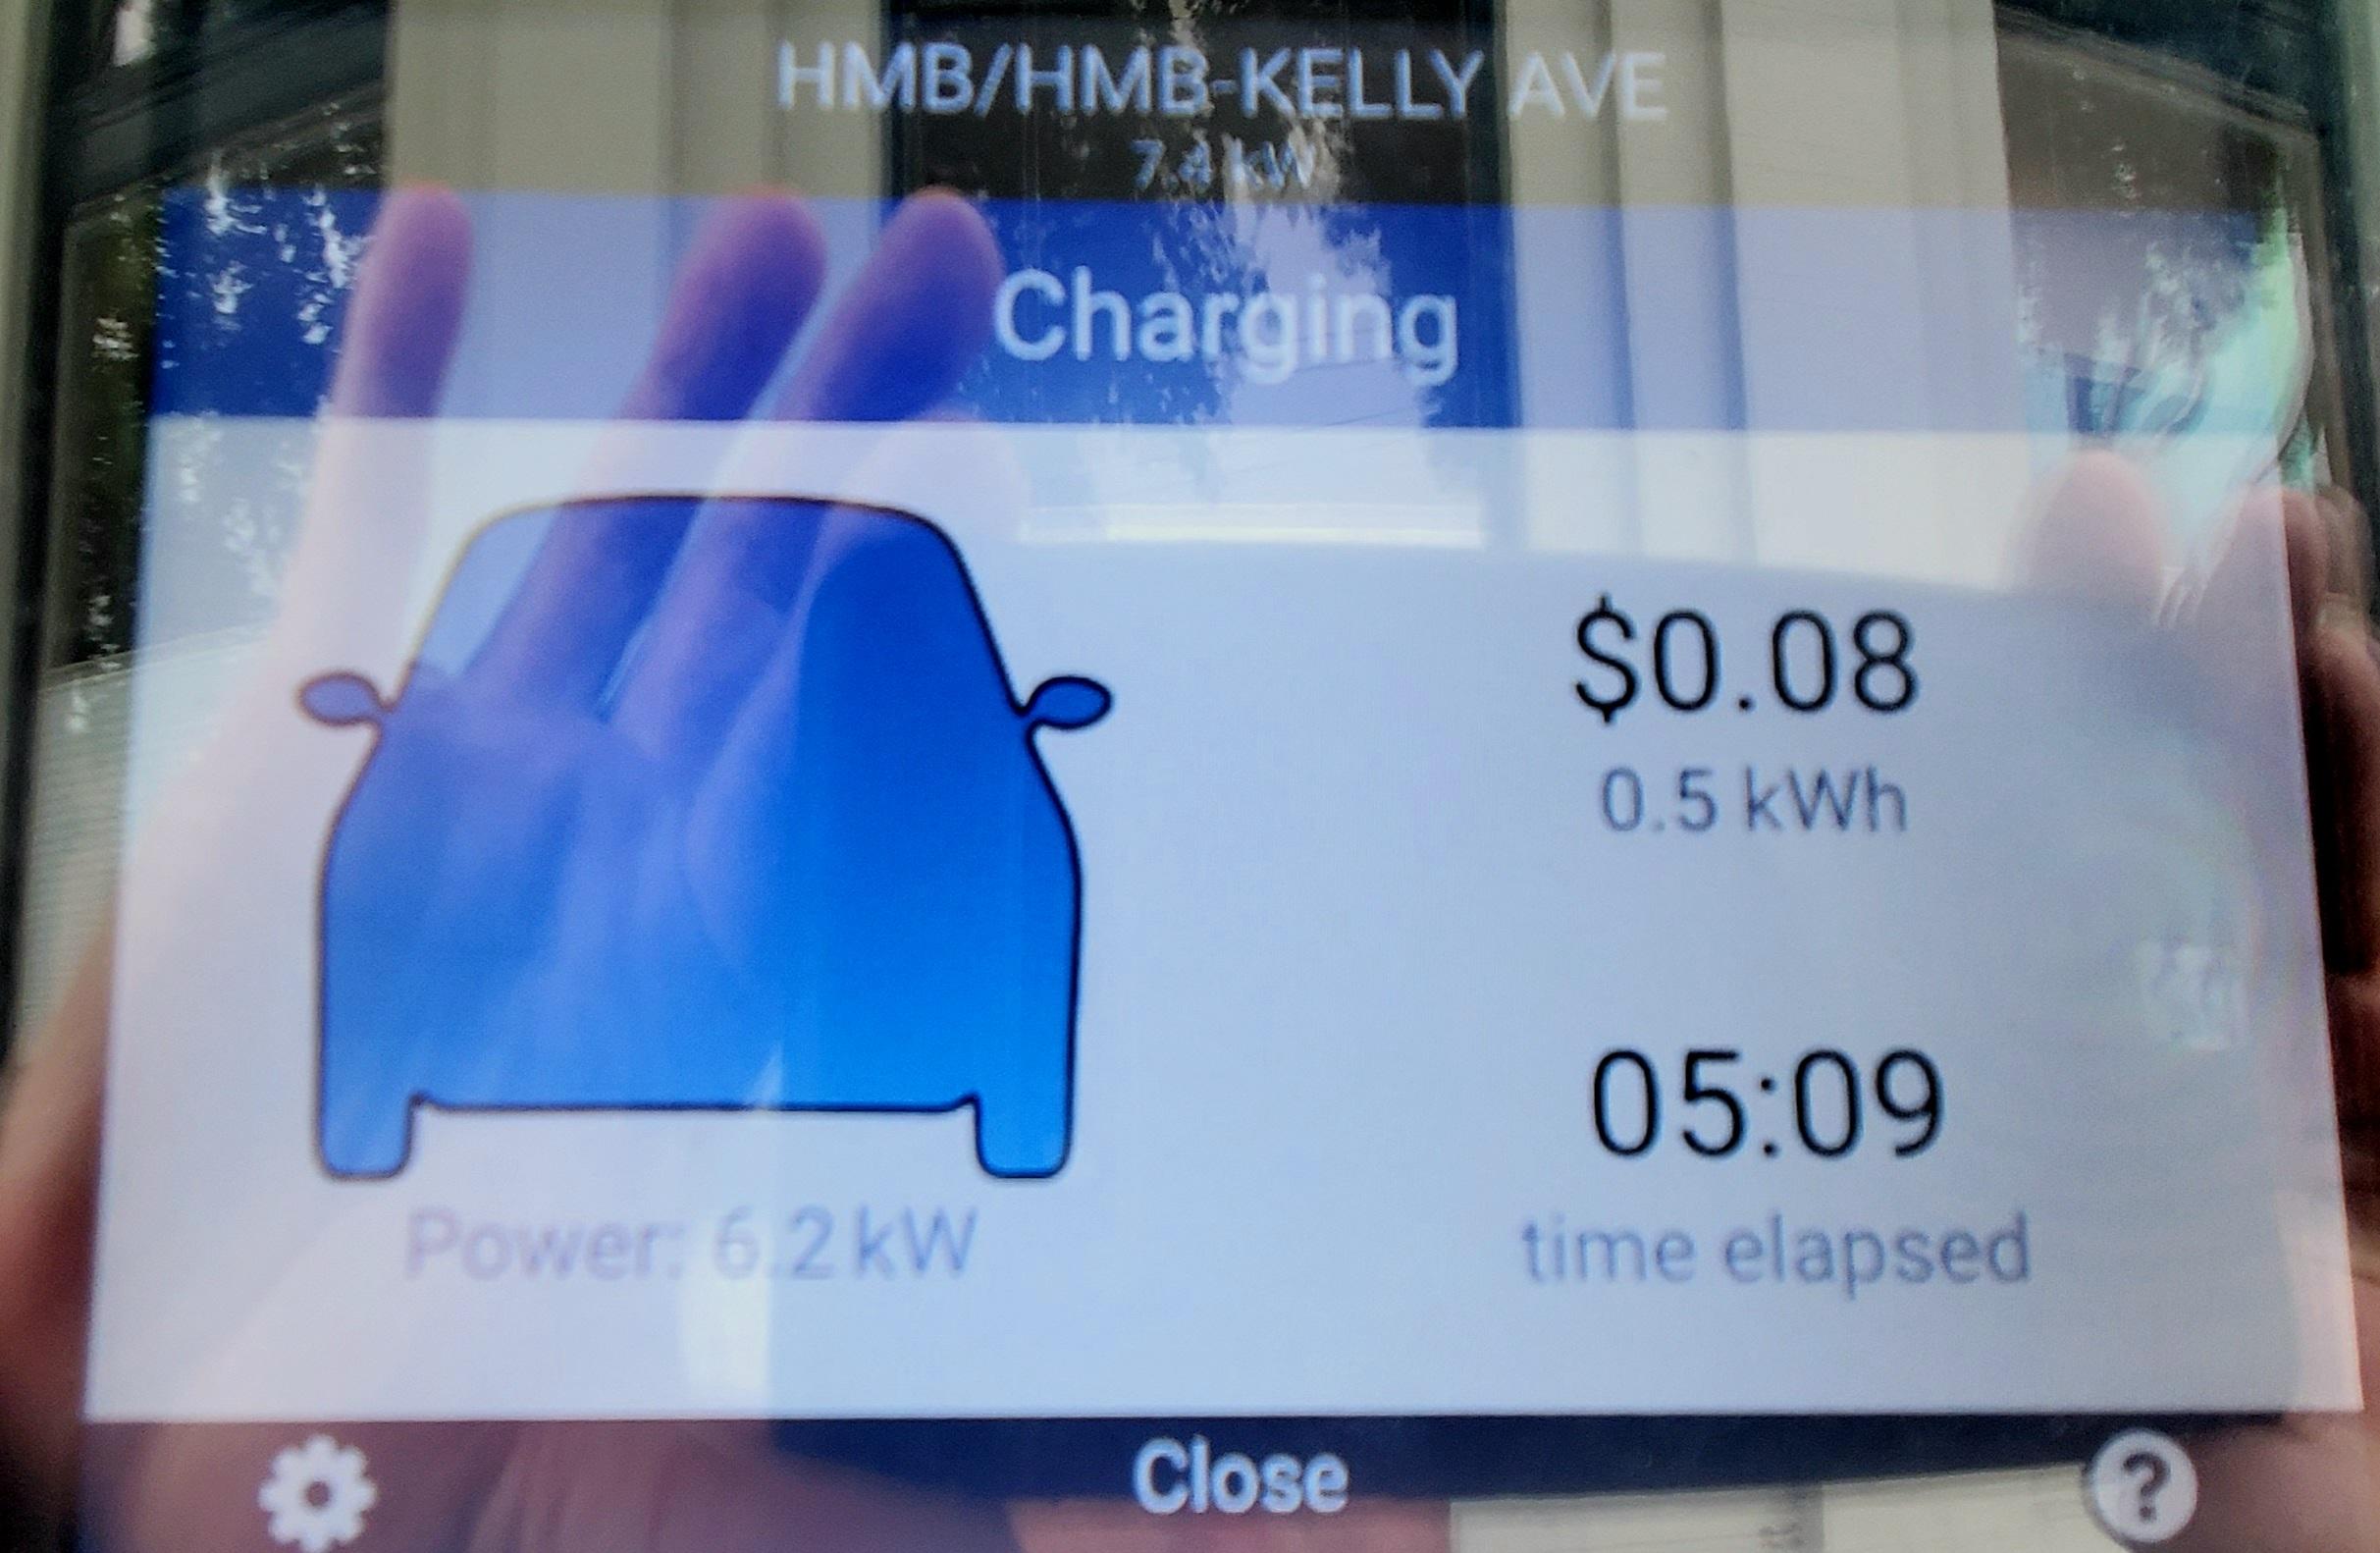 Screen indicator on charging station showing progress